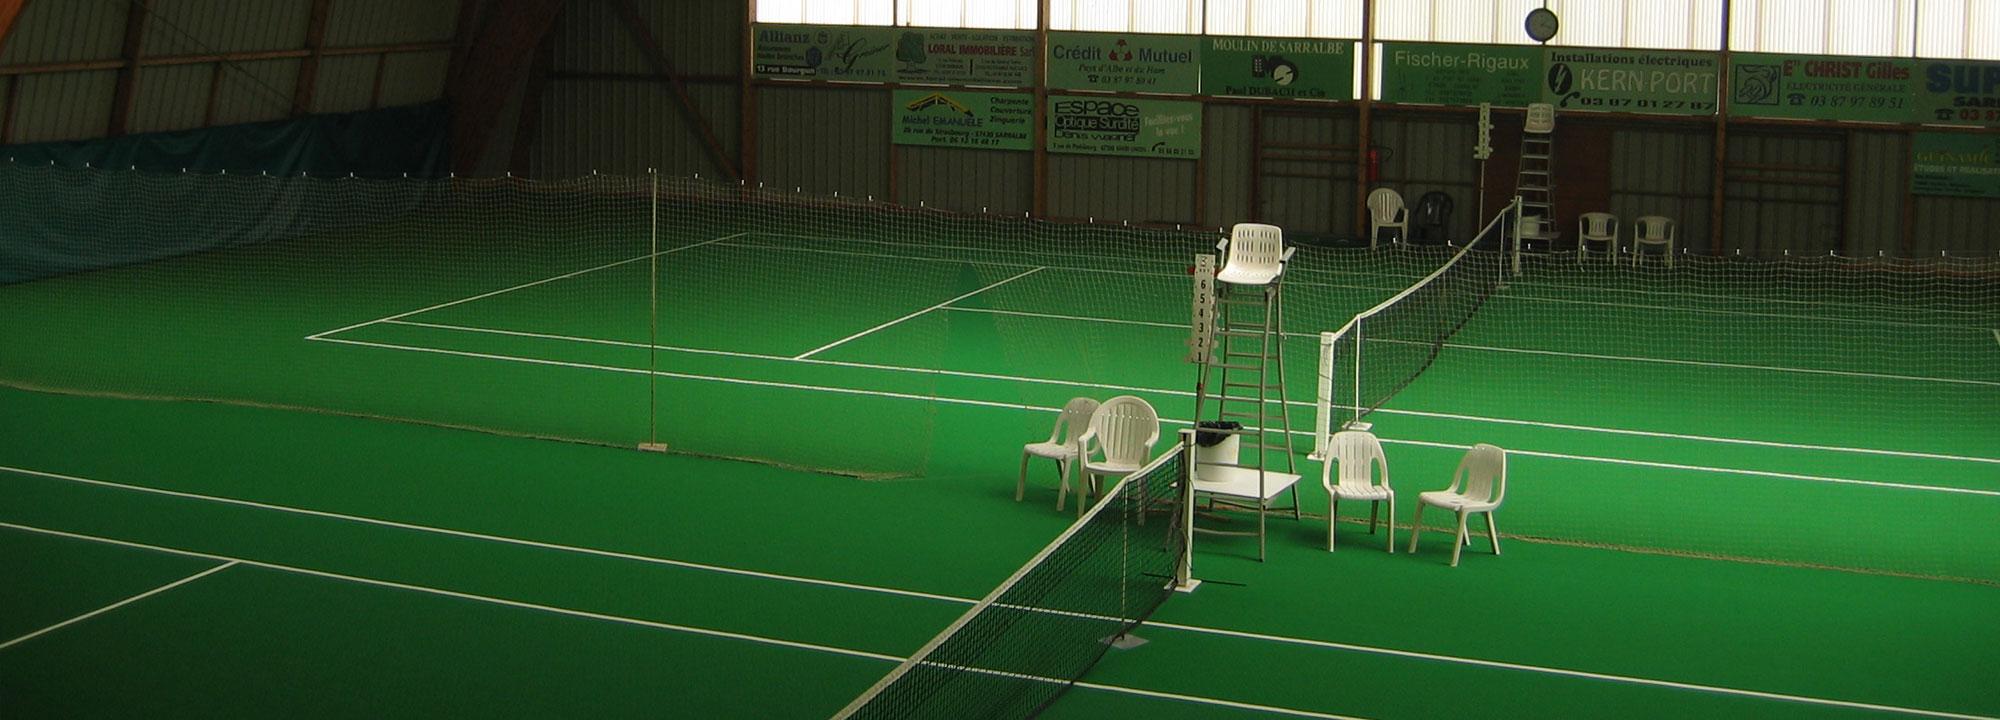 Tennis Club Sarralbe pour Piscine Sarralbe